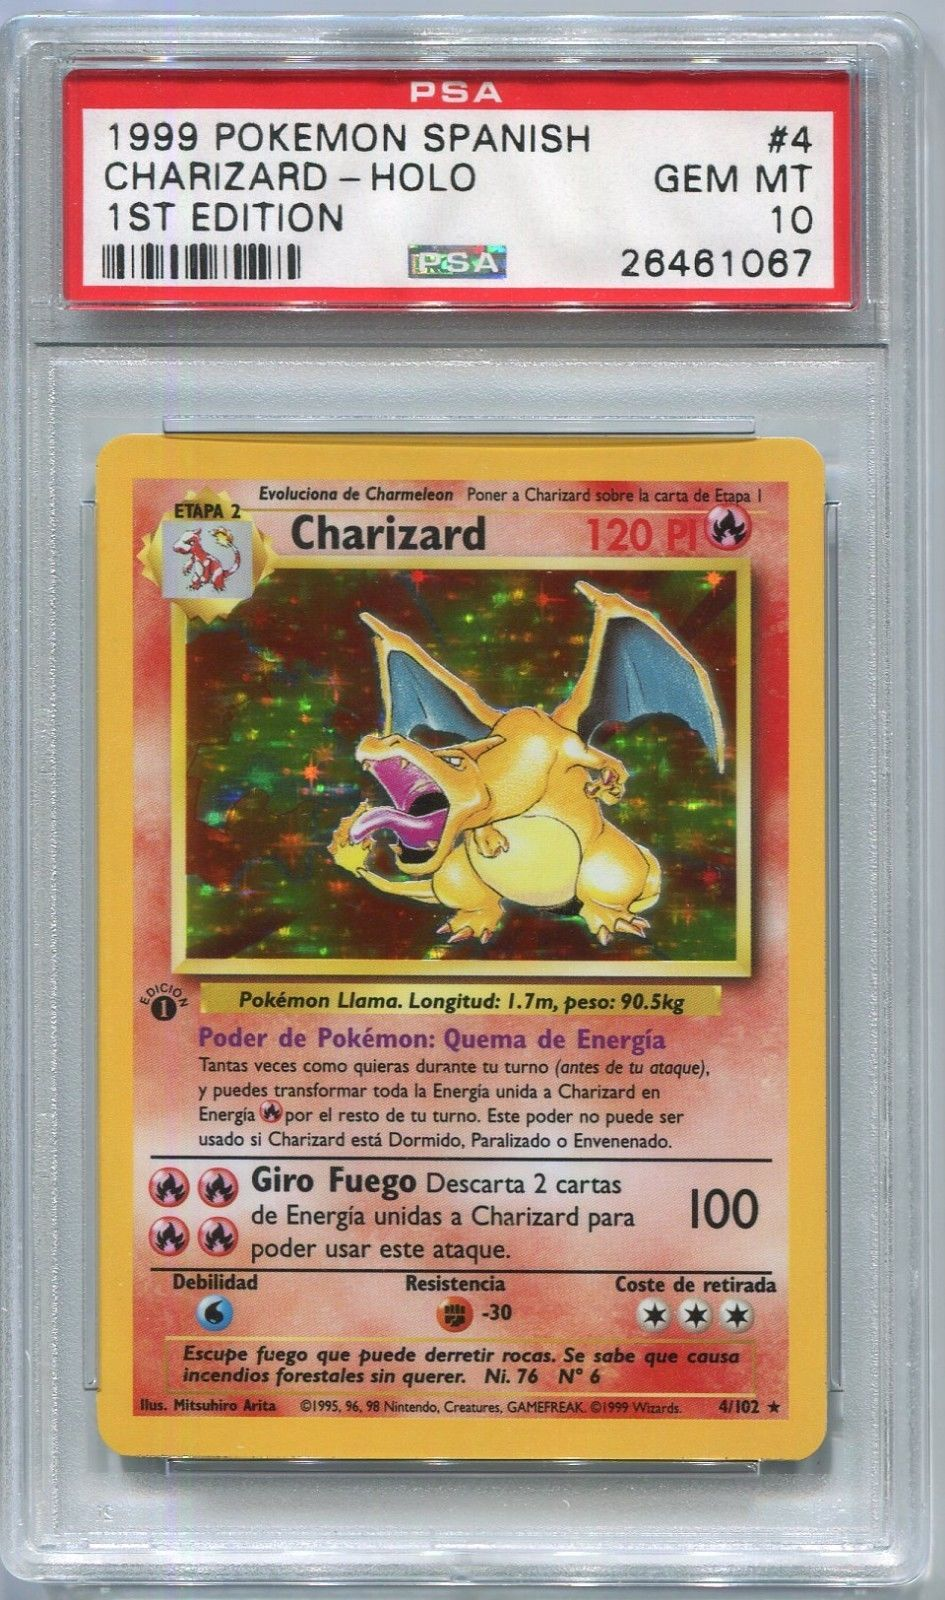 Pokemon Spanish 1st Edition Charizard Base Set 4/102, PSA 10